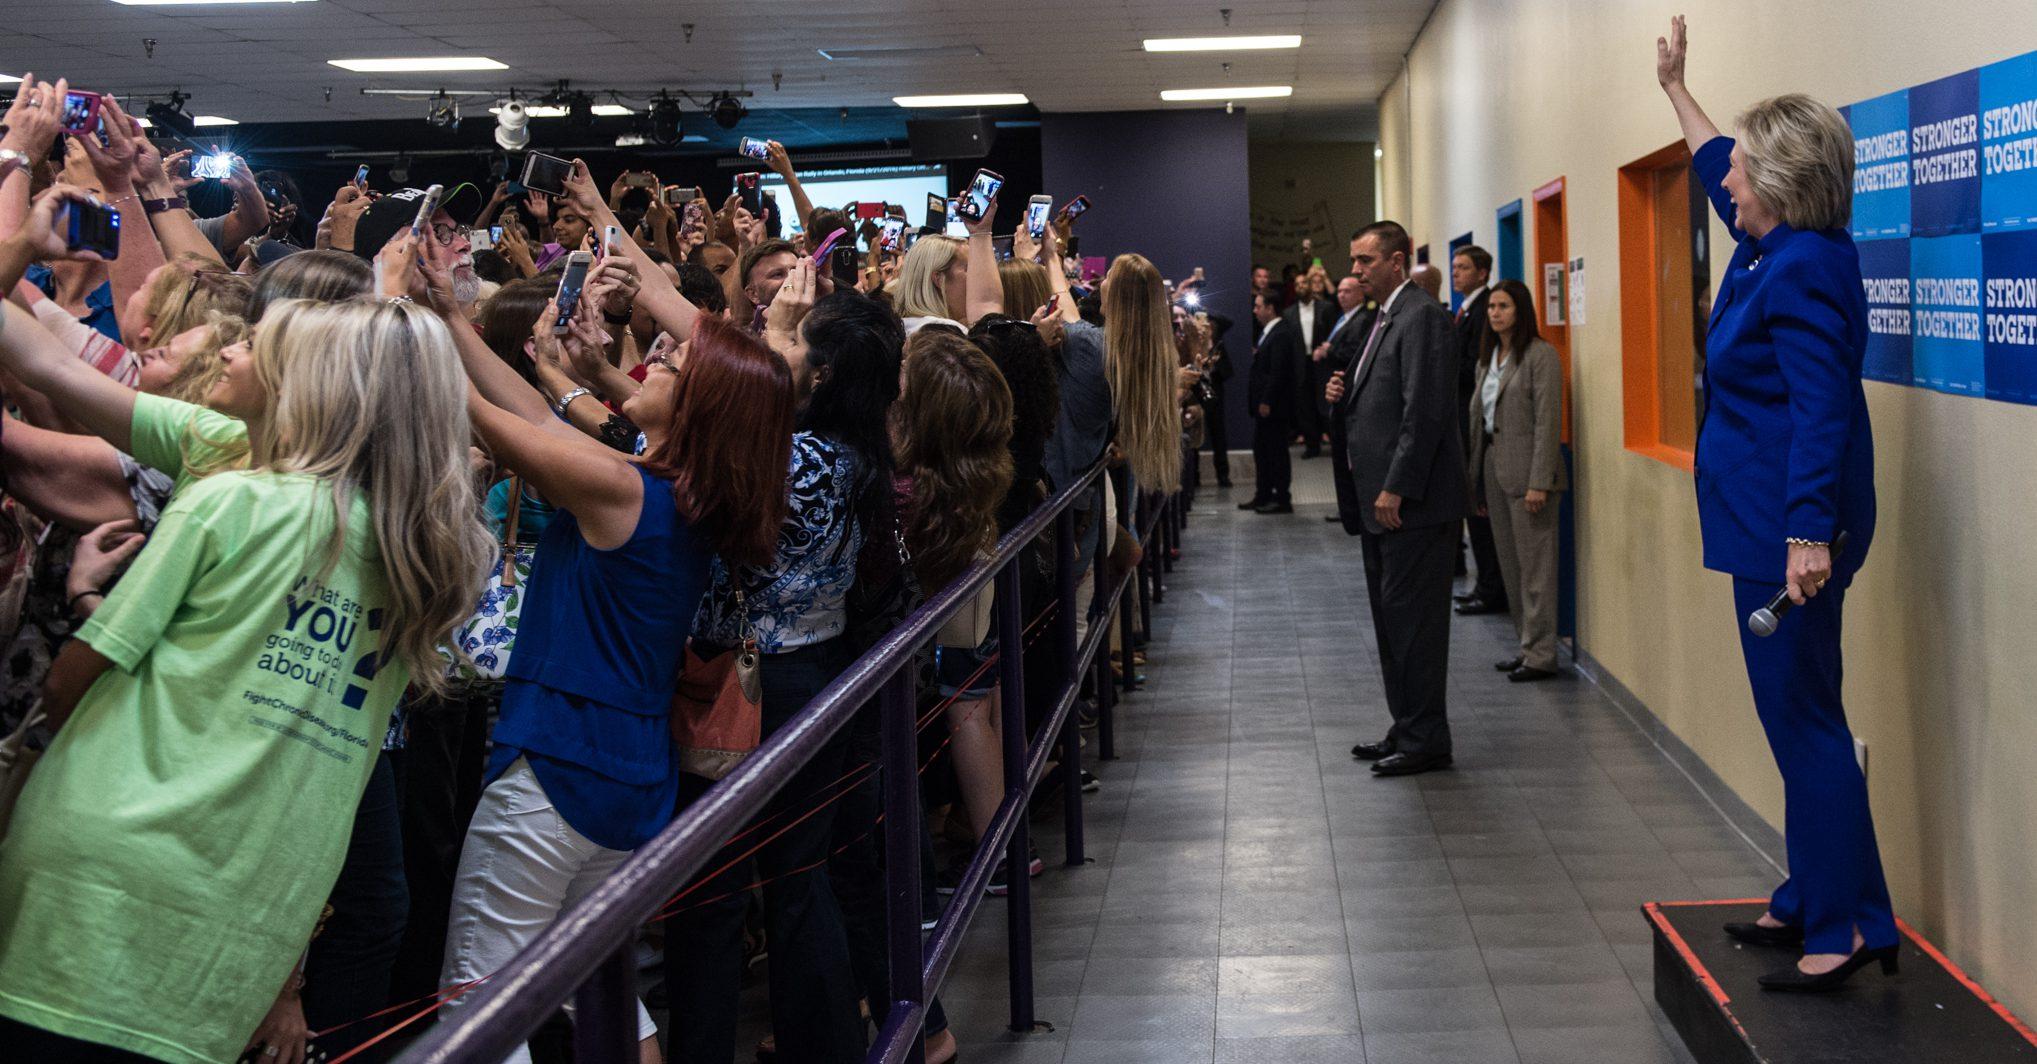 160927-hillary_clinton_rally_selfie